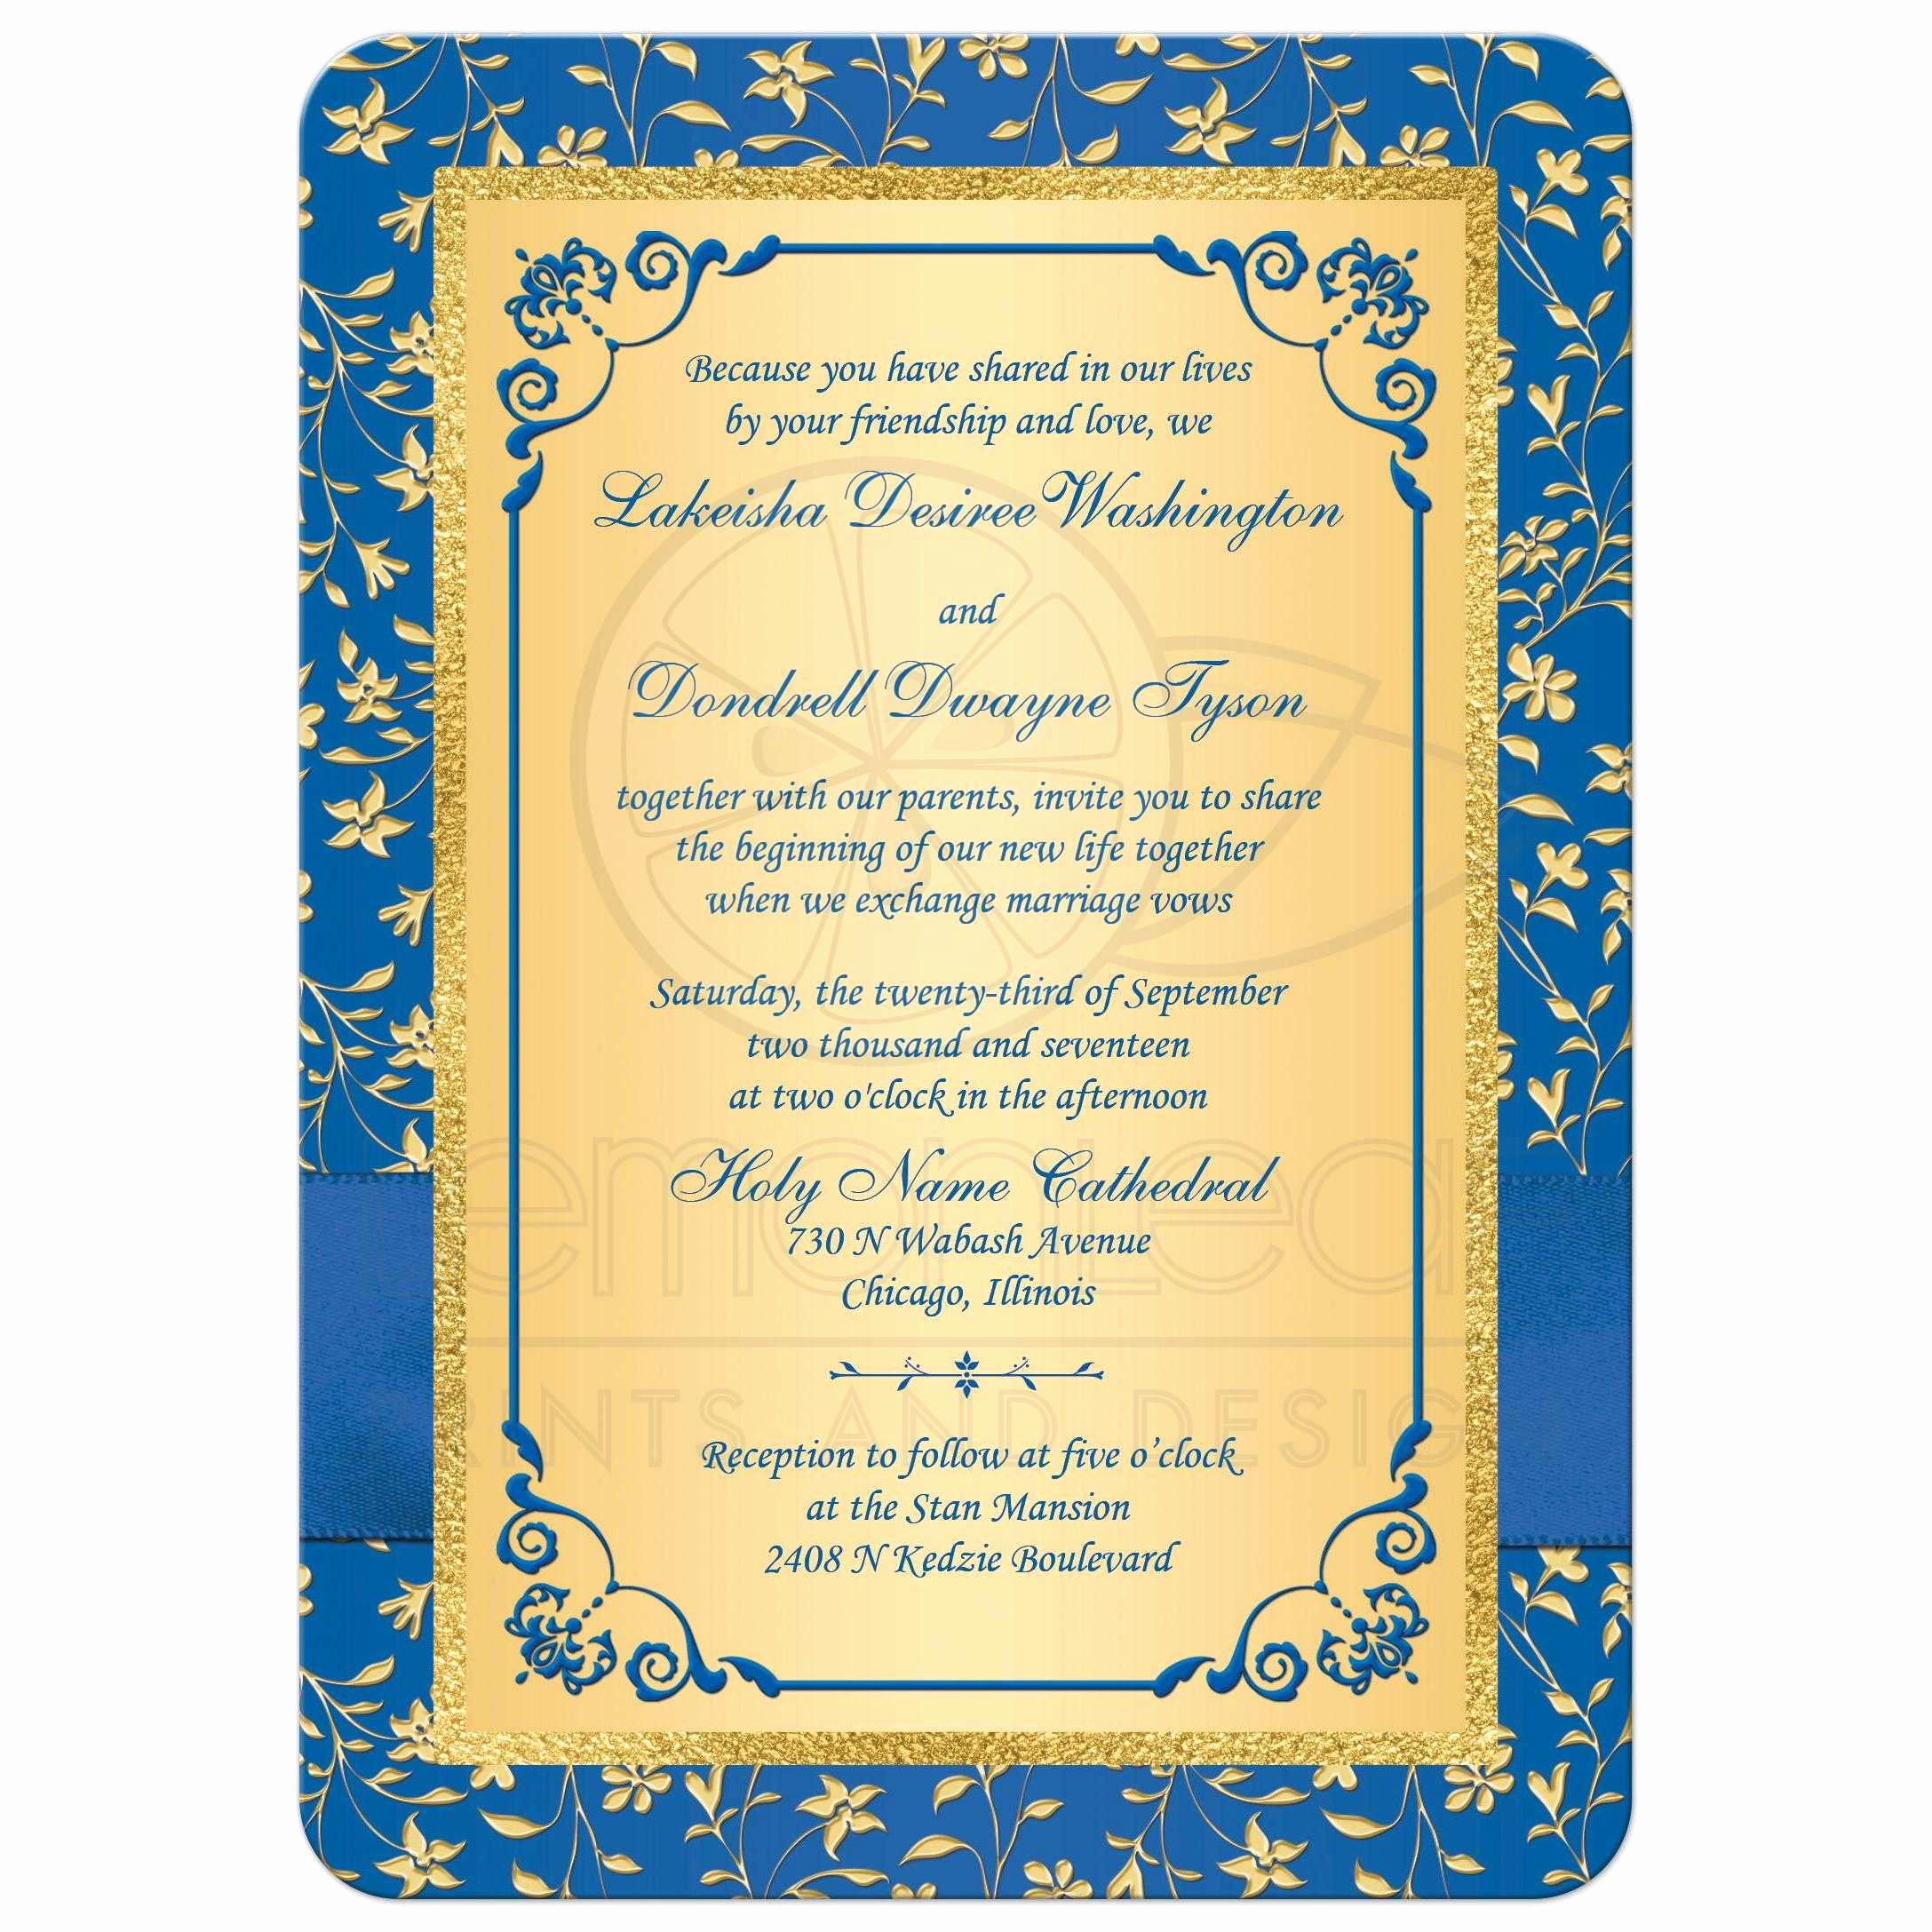 Blue and Gold Invitation Template Elegant Wedding Invitation Printed Ribbon Bow Double